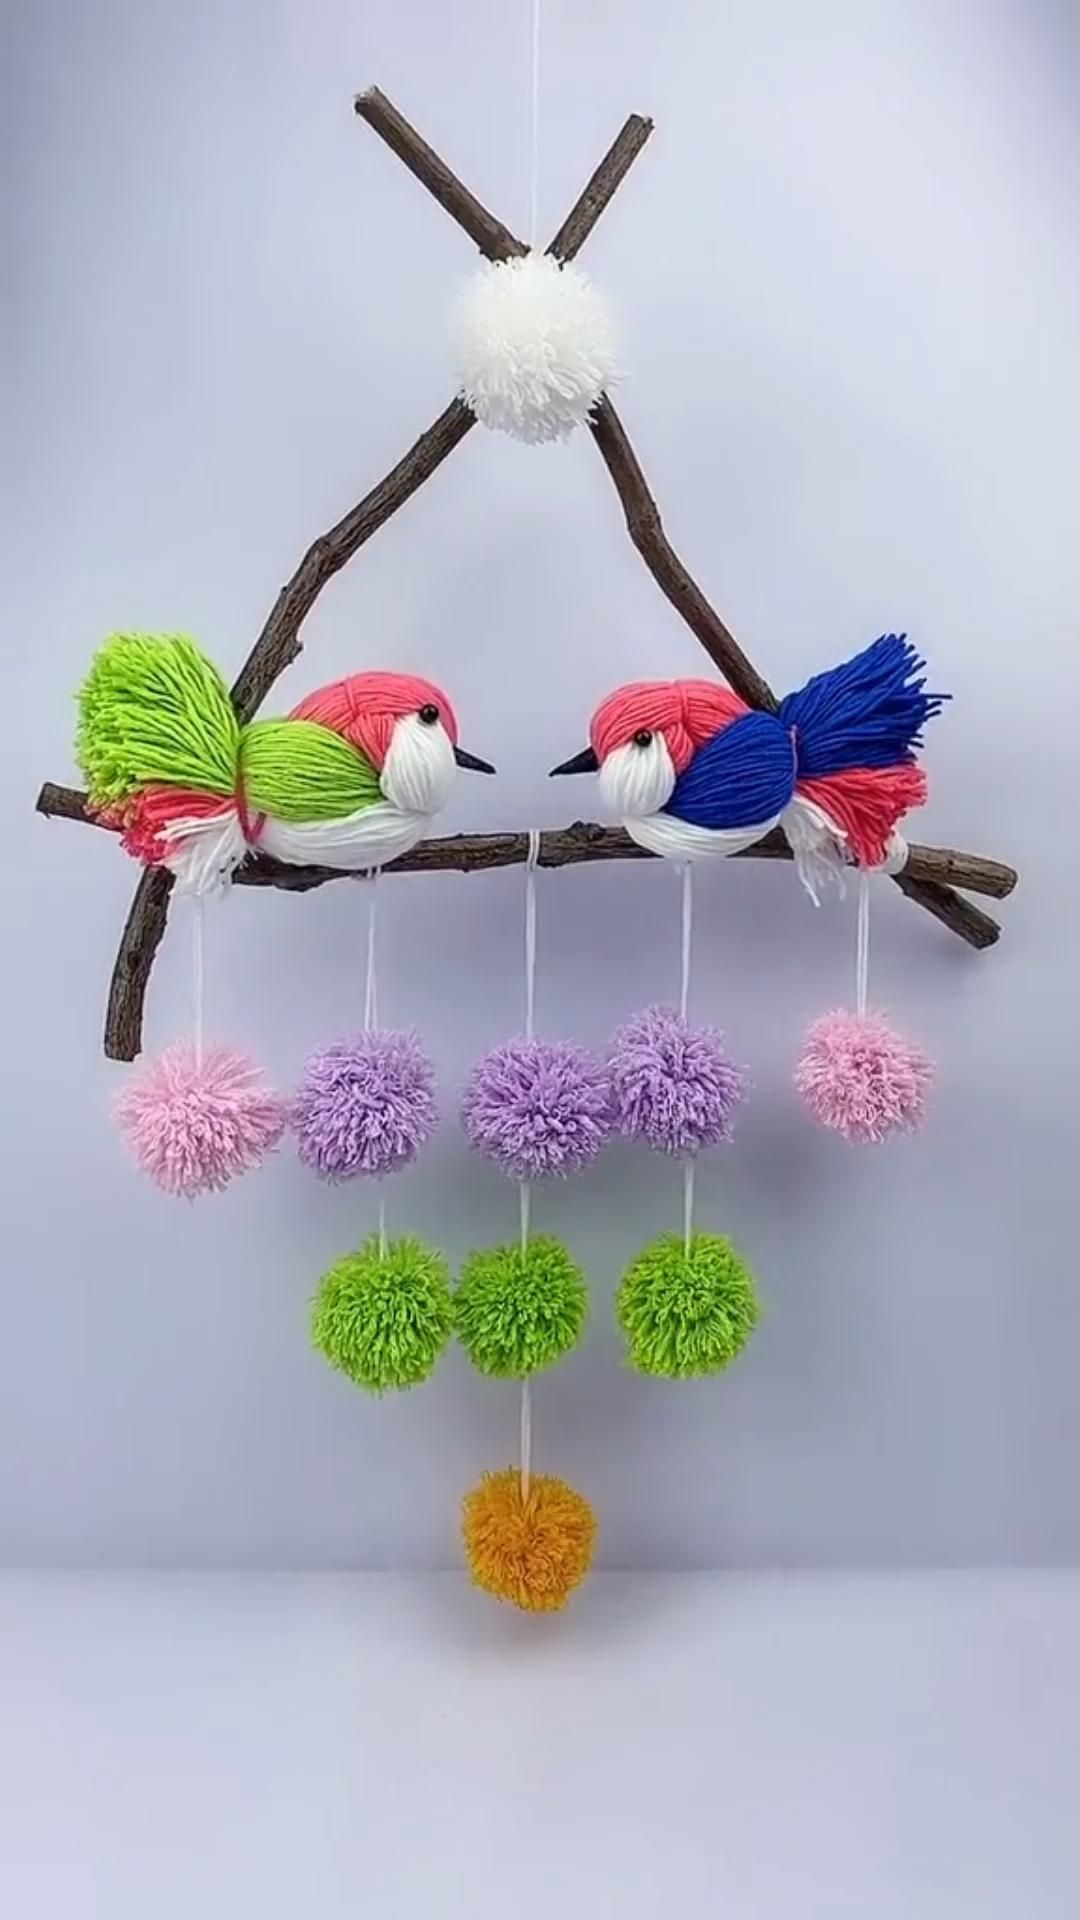 Handmade Acrylic Yarn Birds Wall Hanging